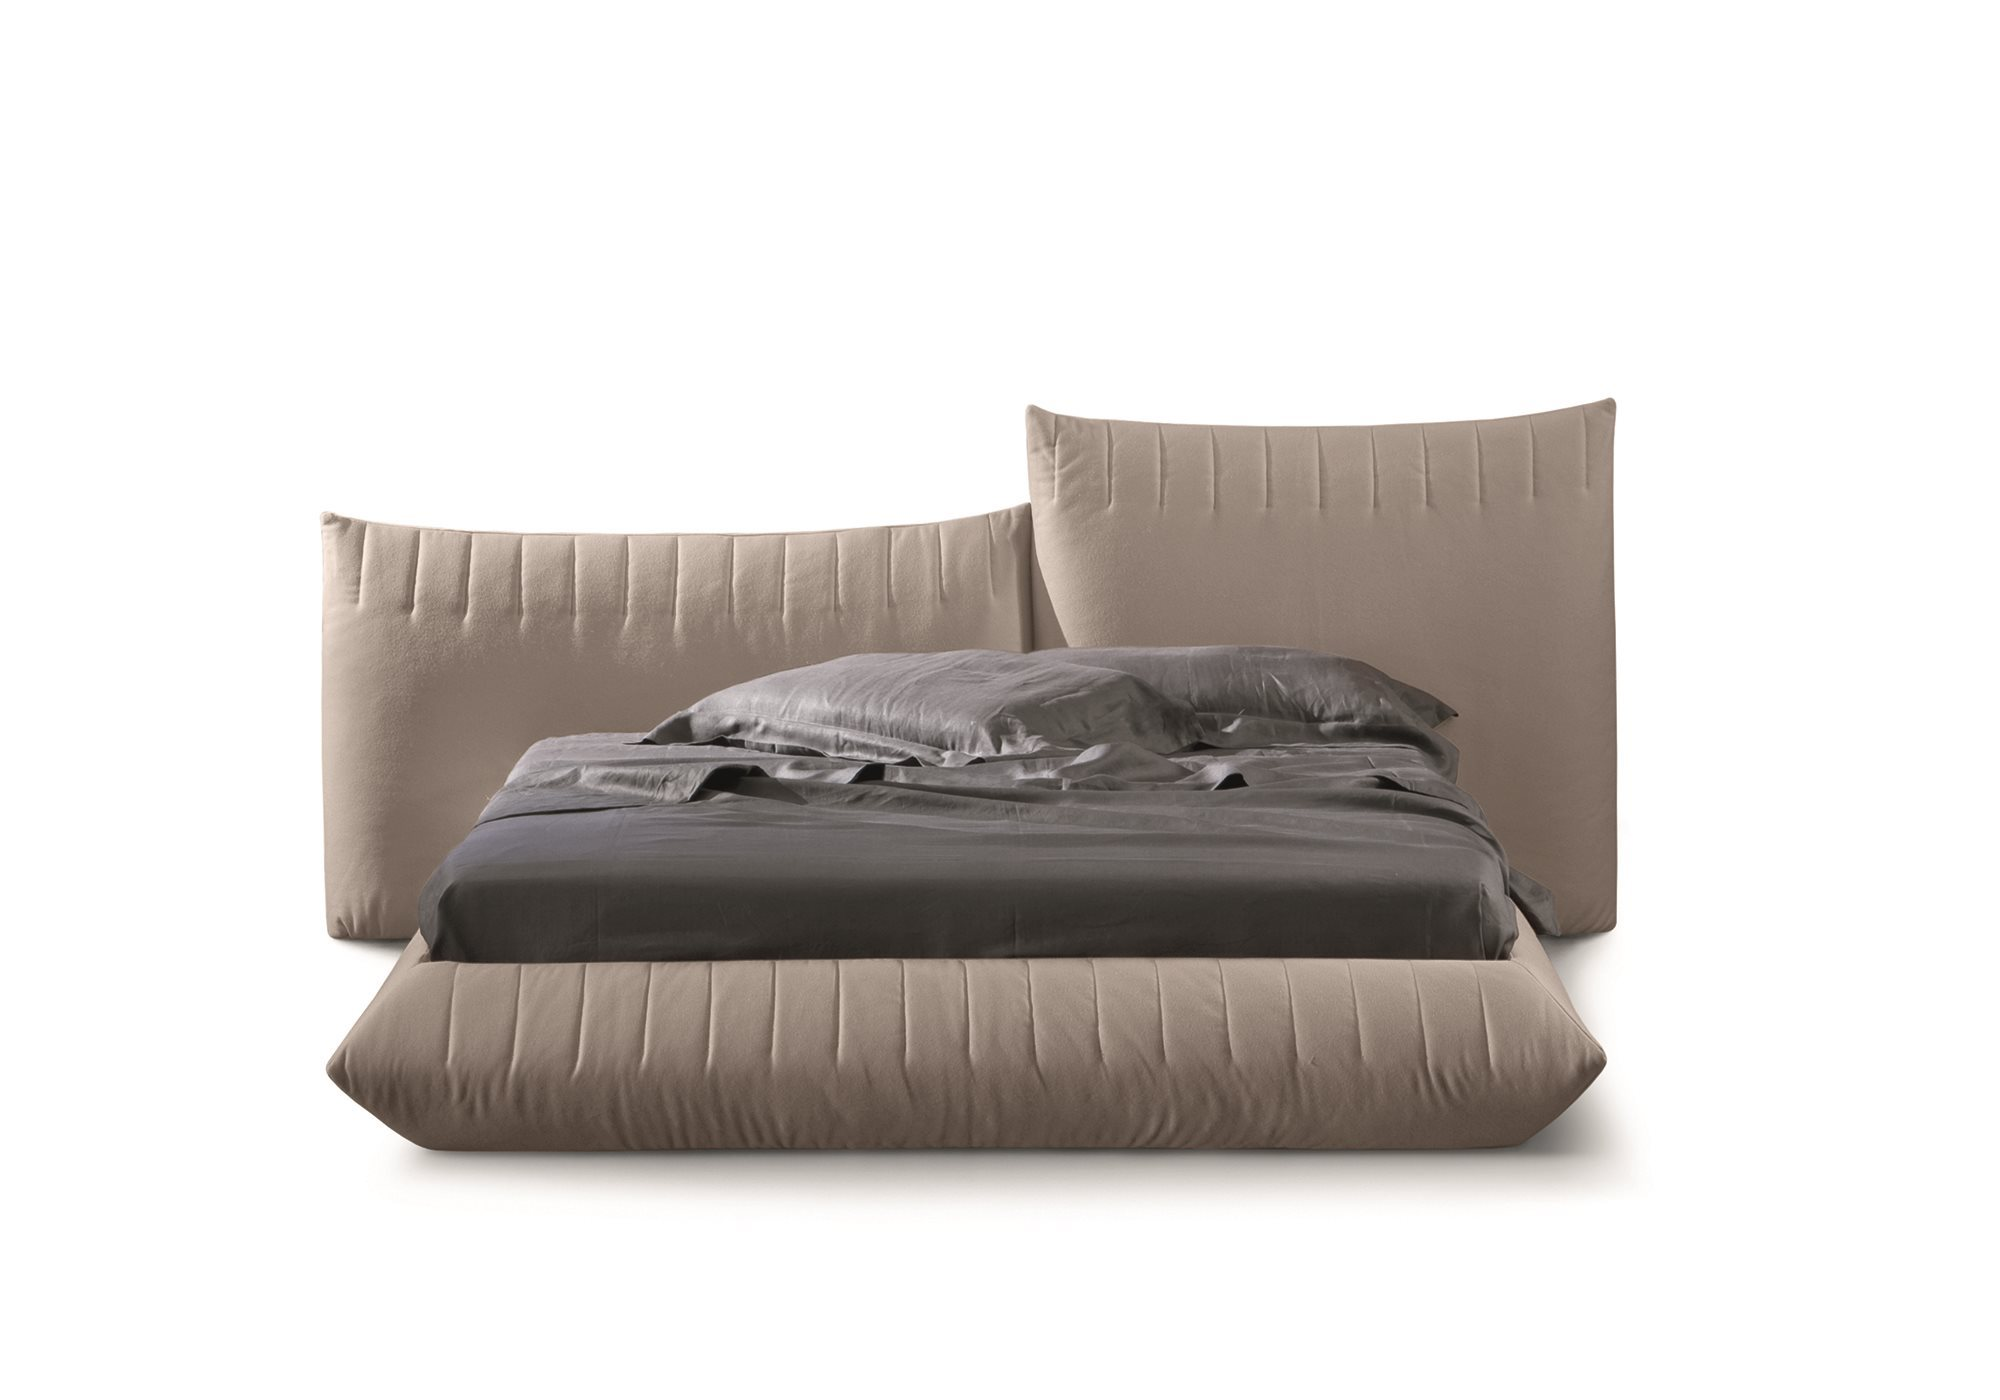 Alberta Salotti Кровать Bellavita от итальянского бренда Alberta Salotti